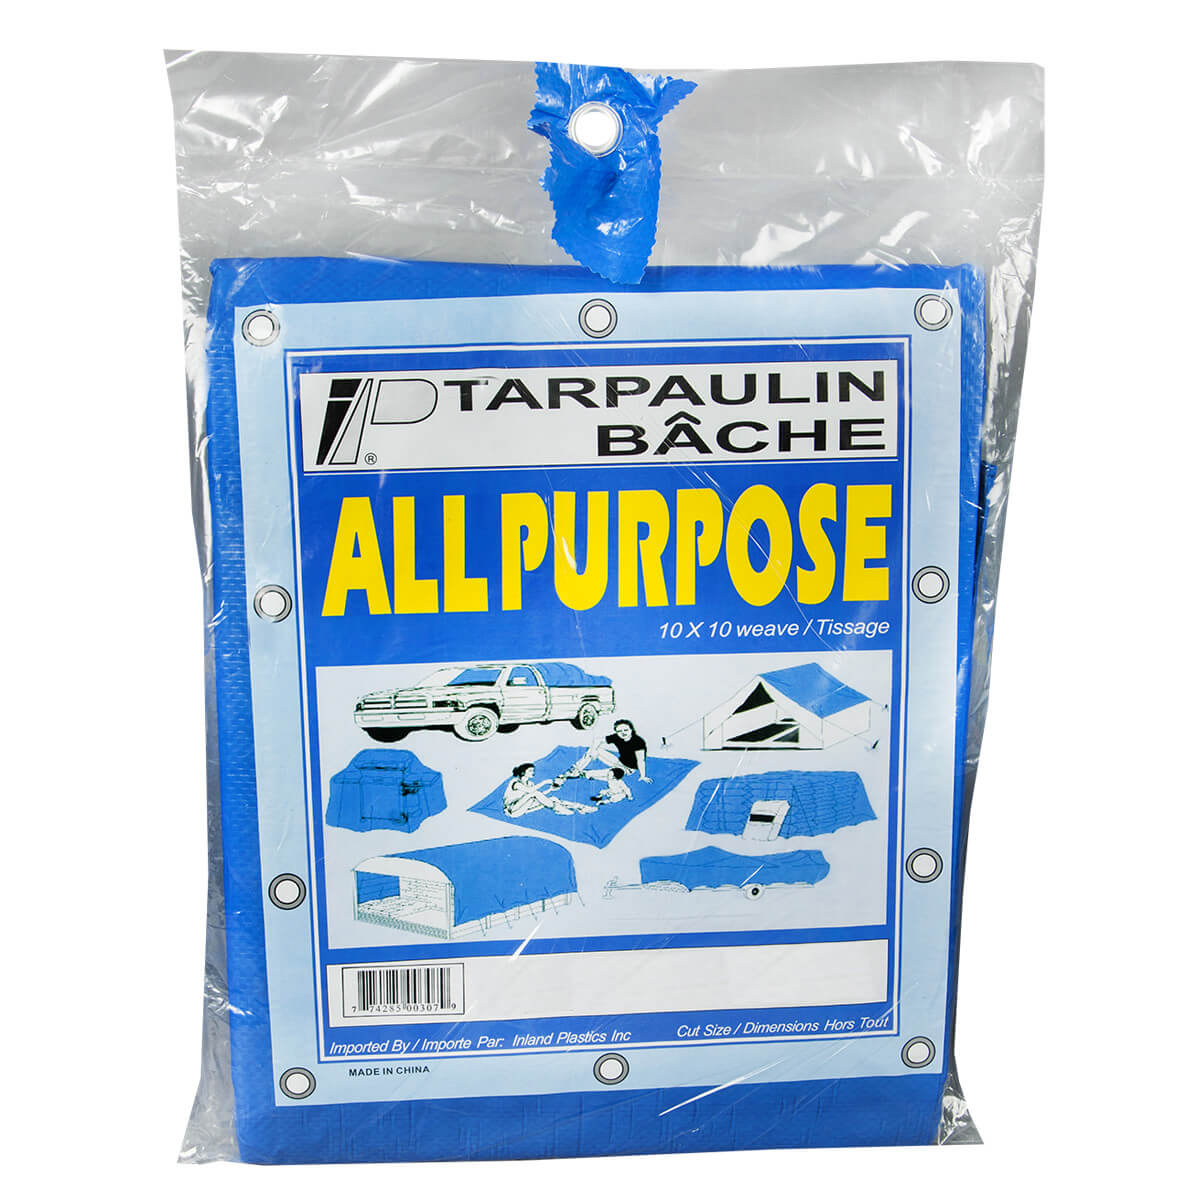 All Purpose Blue Utility Tarps - 20' x 20'